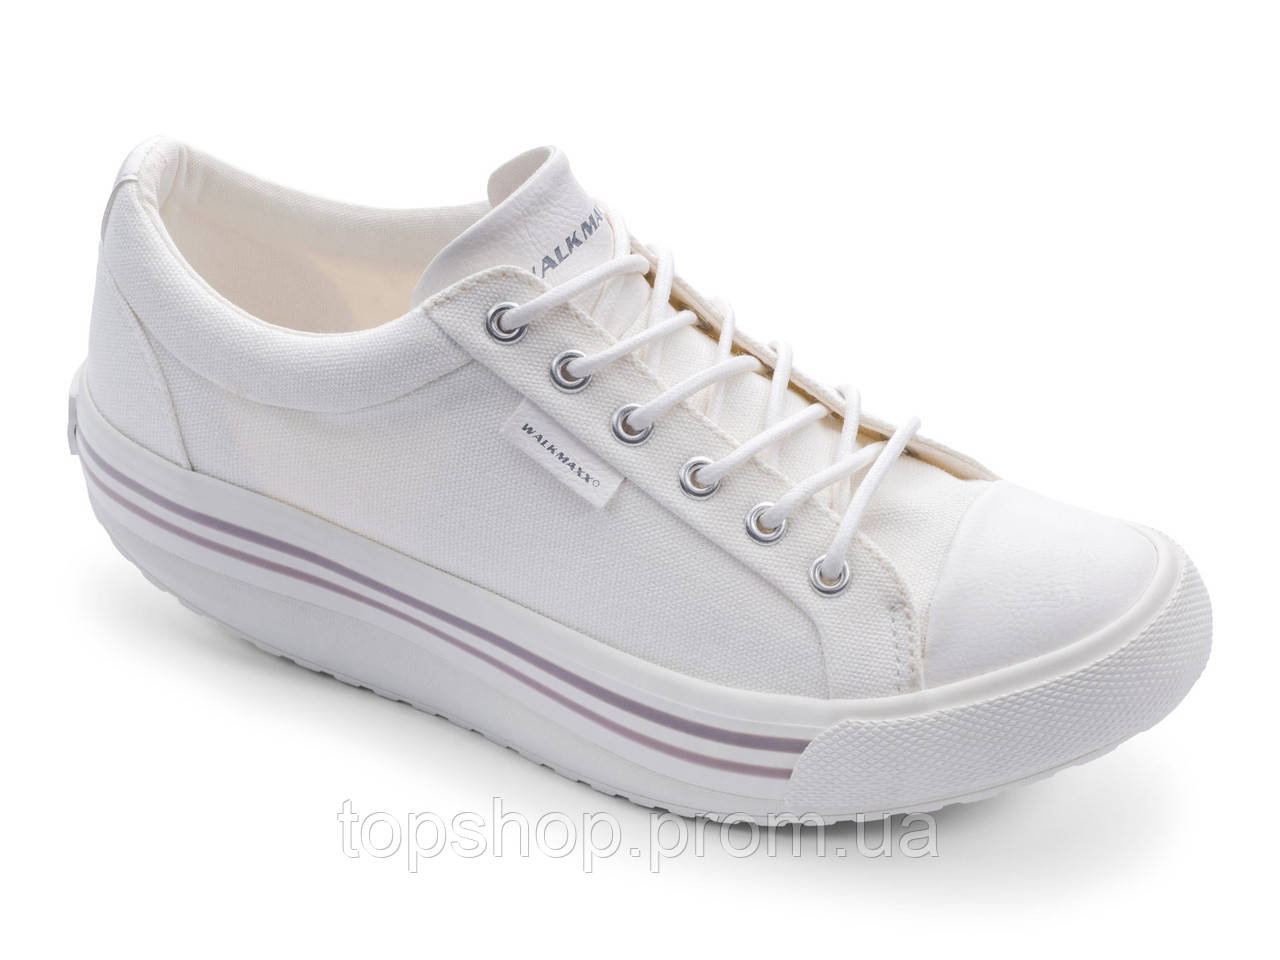 45e59b50f Кеды Walkmaxx Comfort 3.0 39 Длина стопы 25,5 Белый - TopShop - Товары с